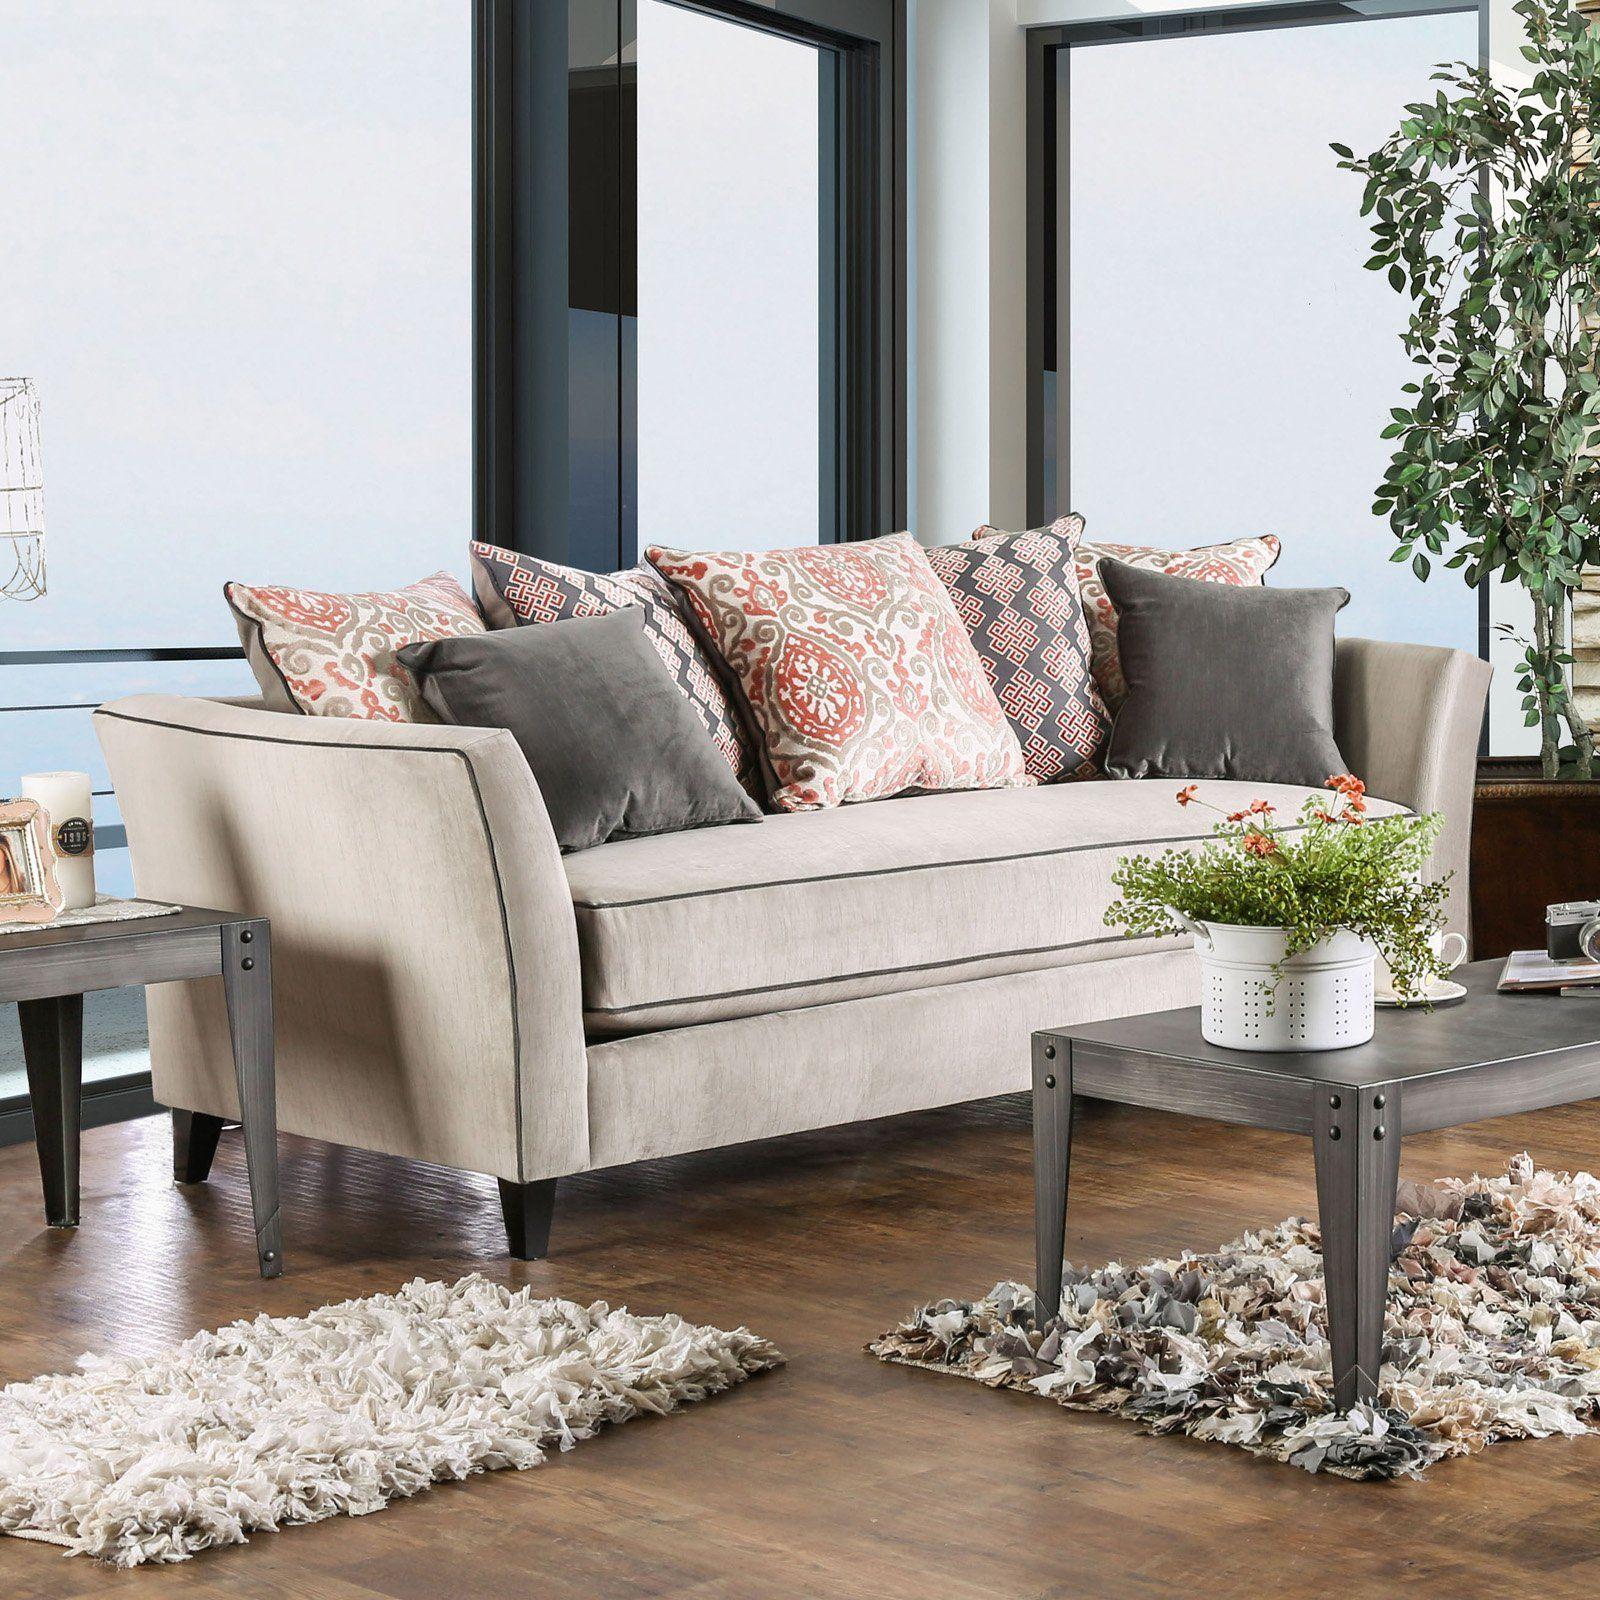 Furniture Of America Amarla Transitional Style Premium Velvet Like